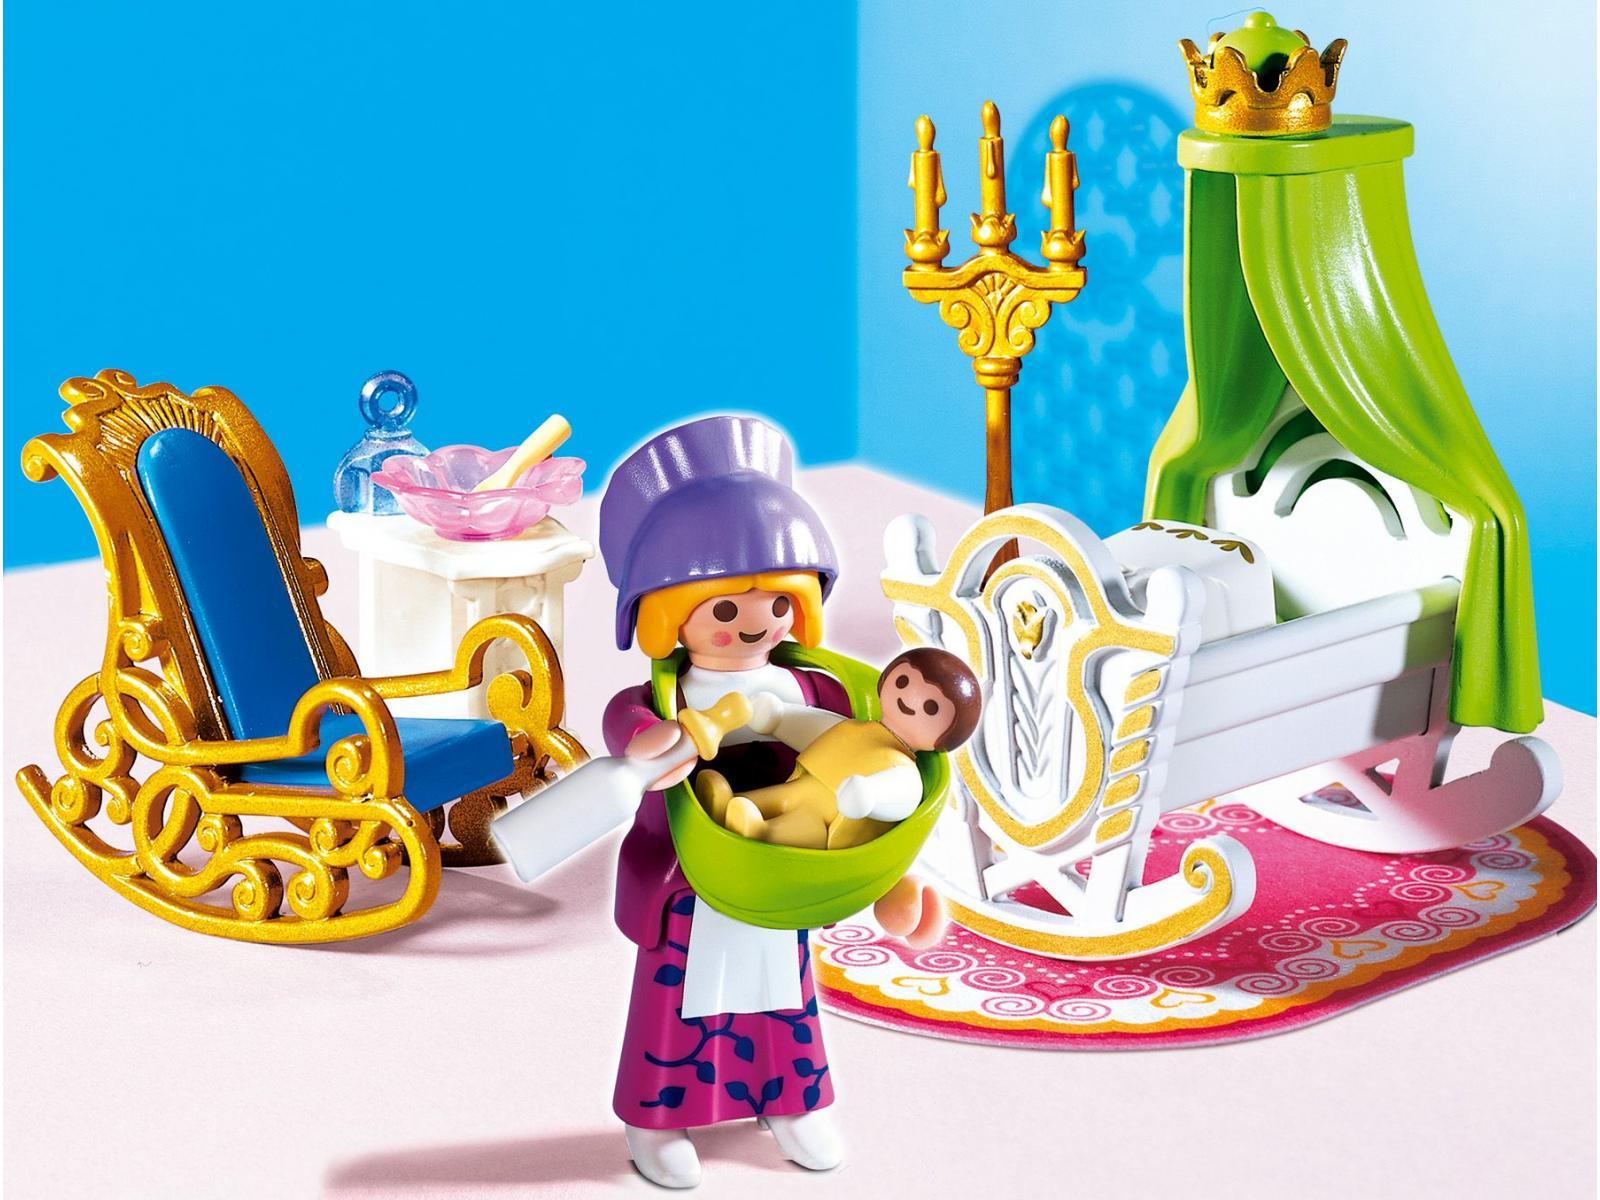 Playmobil Prinsessen Slaapkamer : mots clés princesse playmobil ...